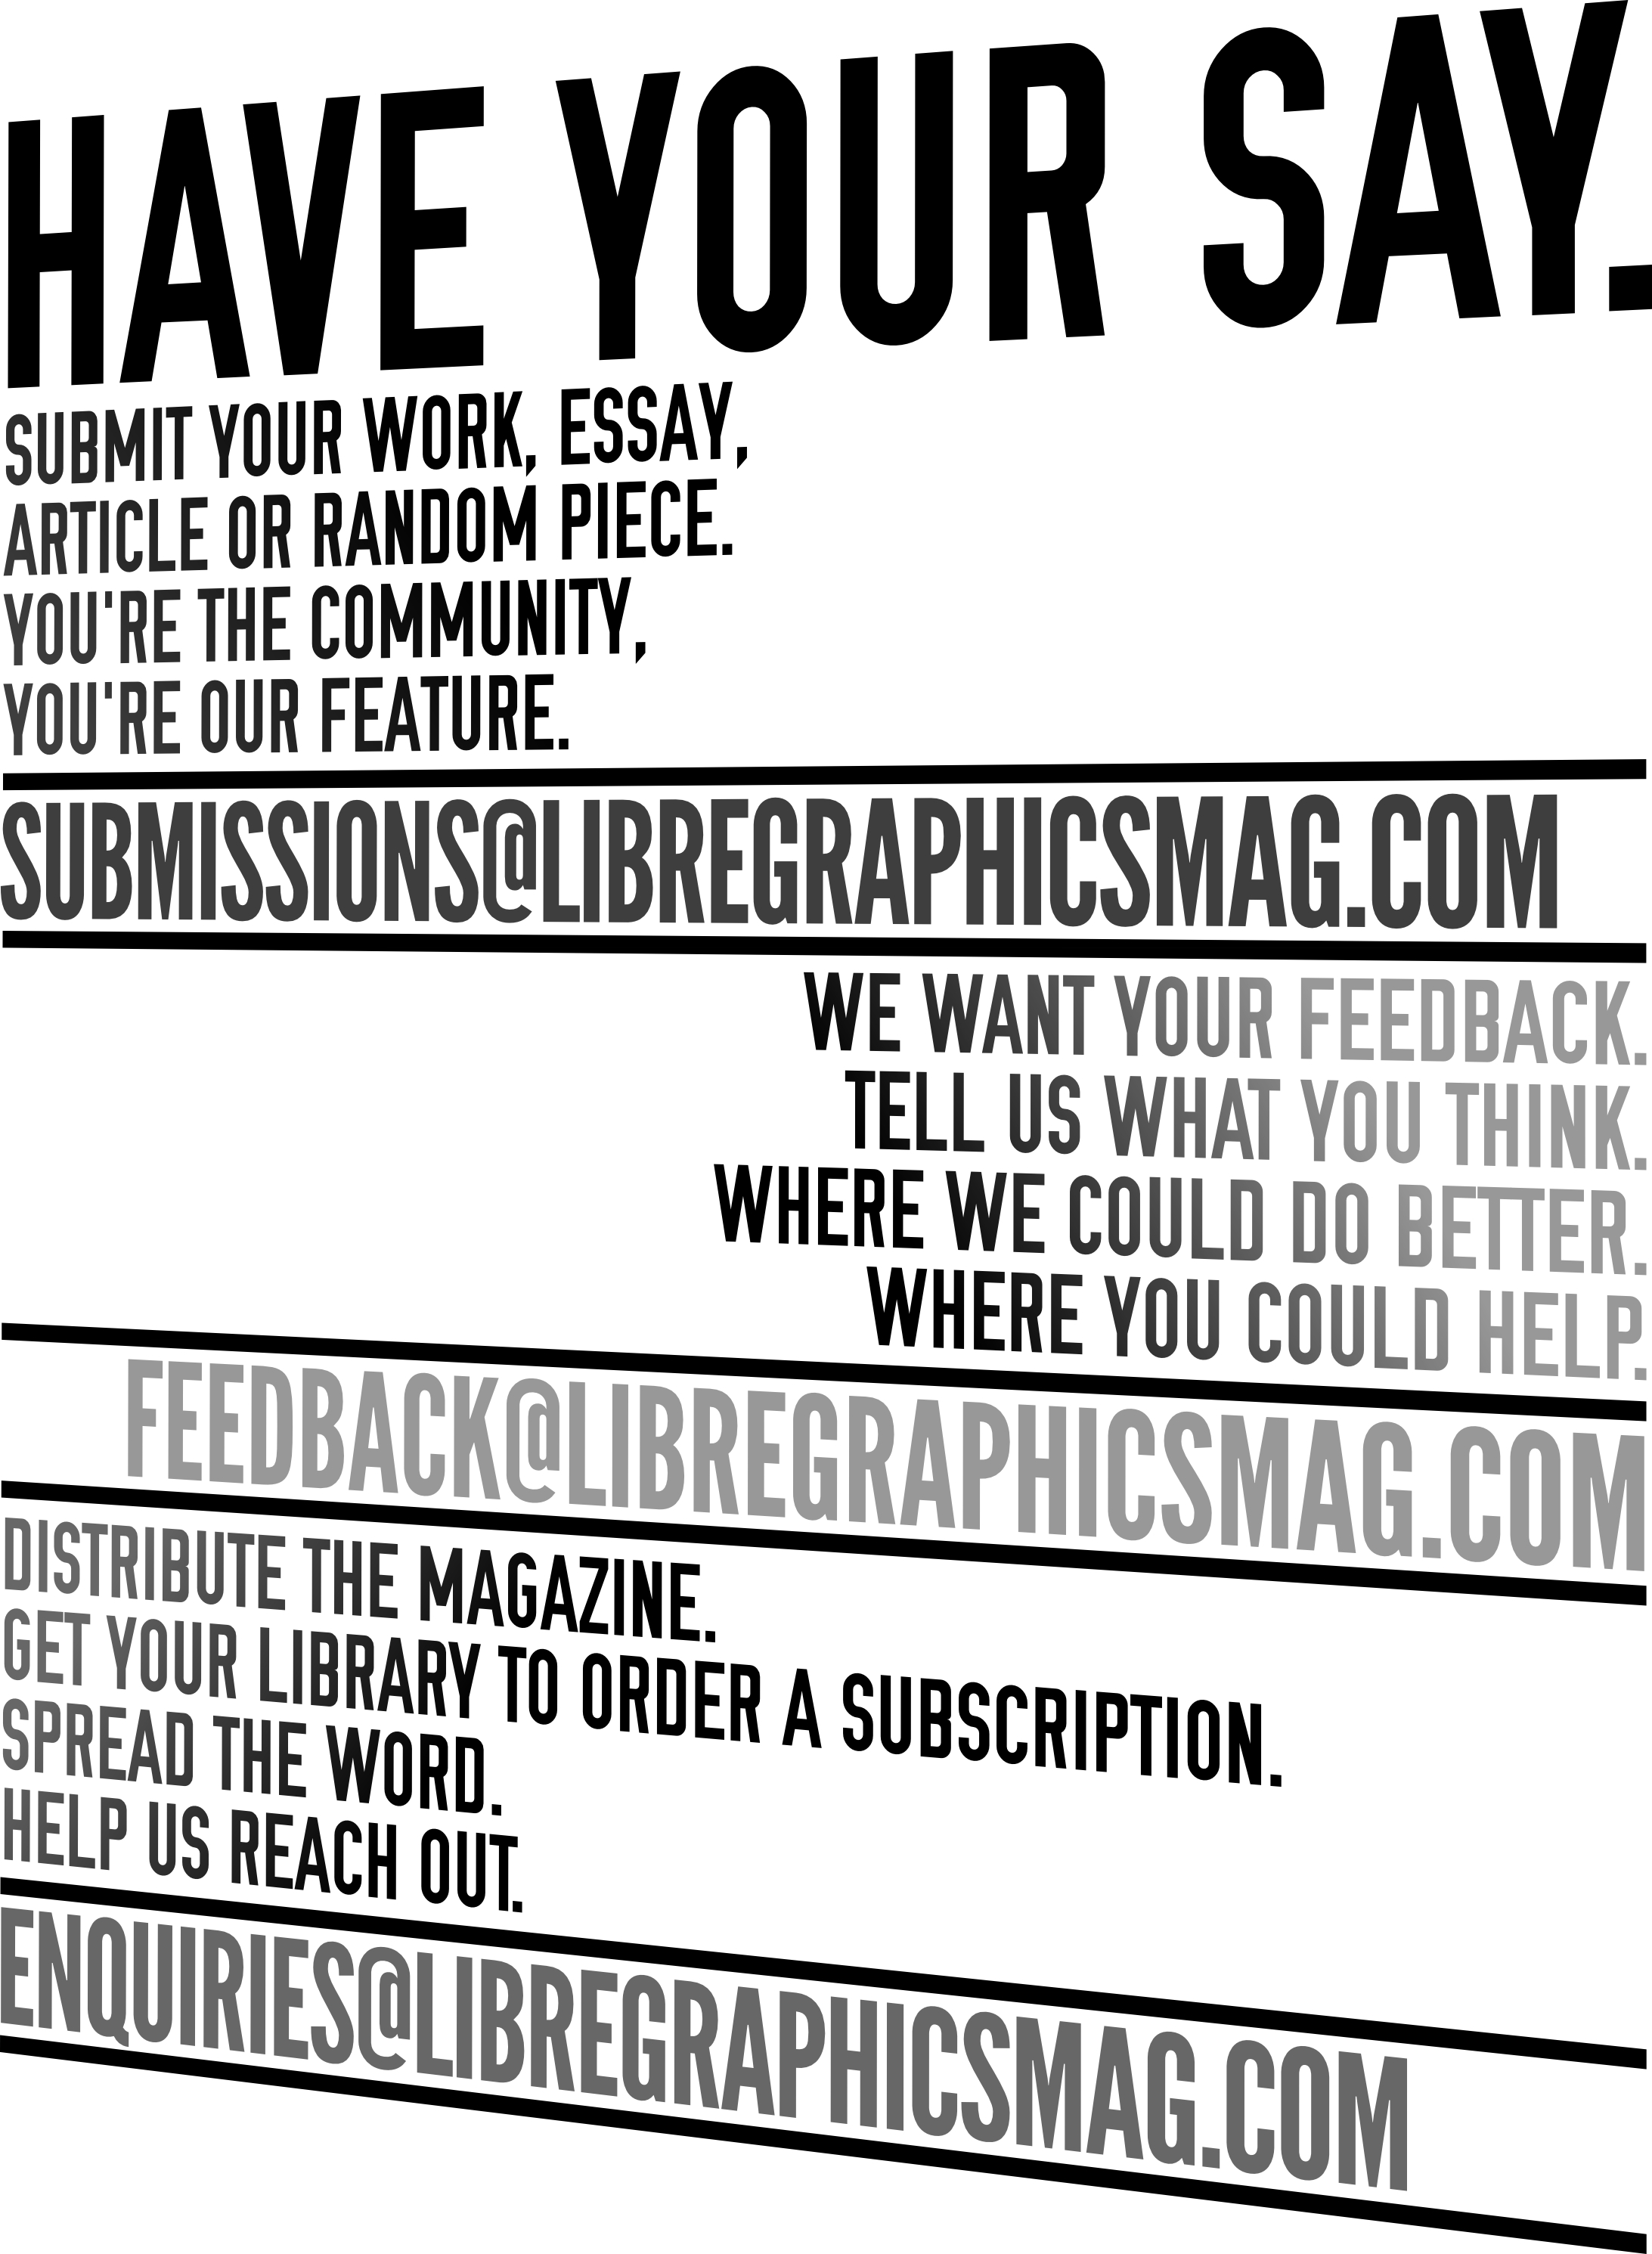 ads/haveyoursay.jpg